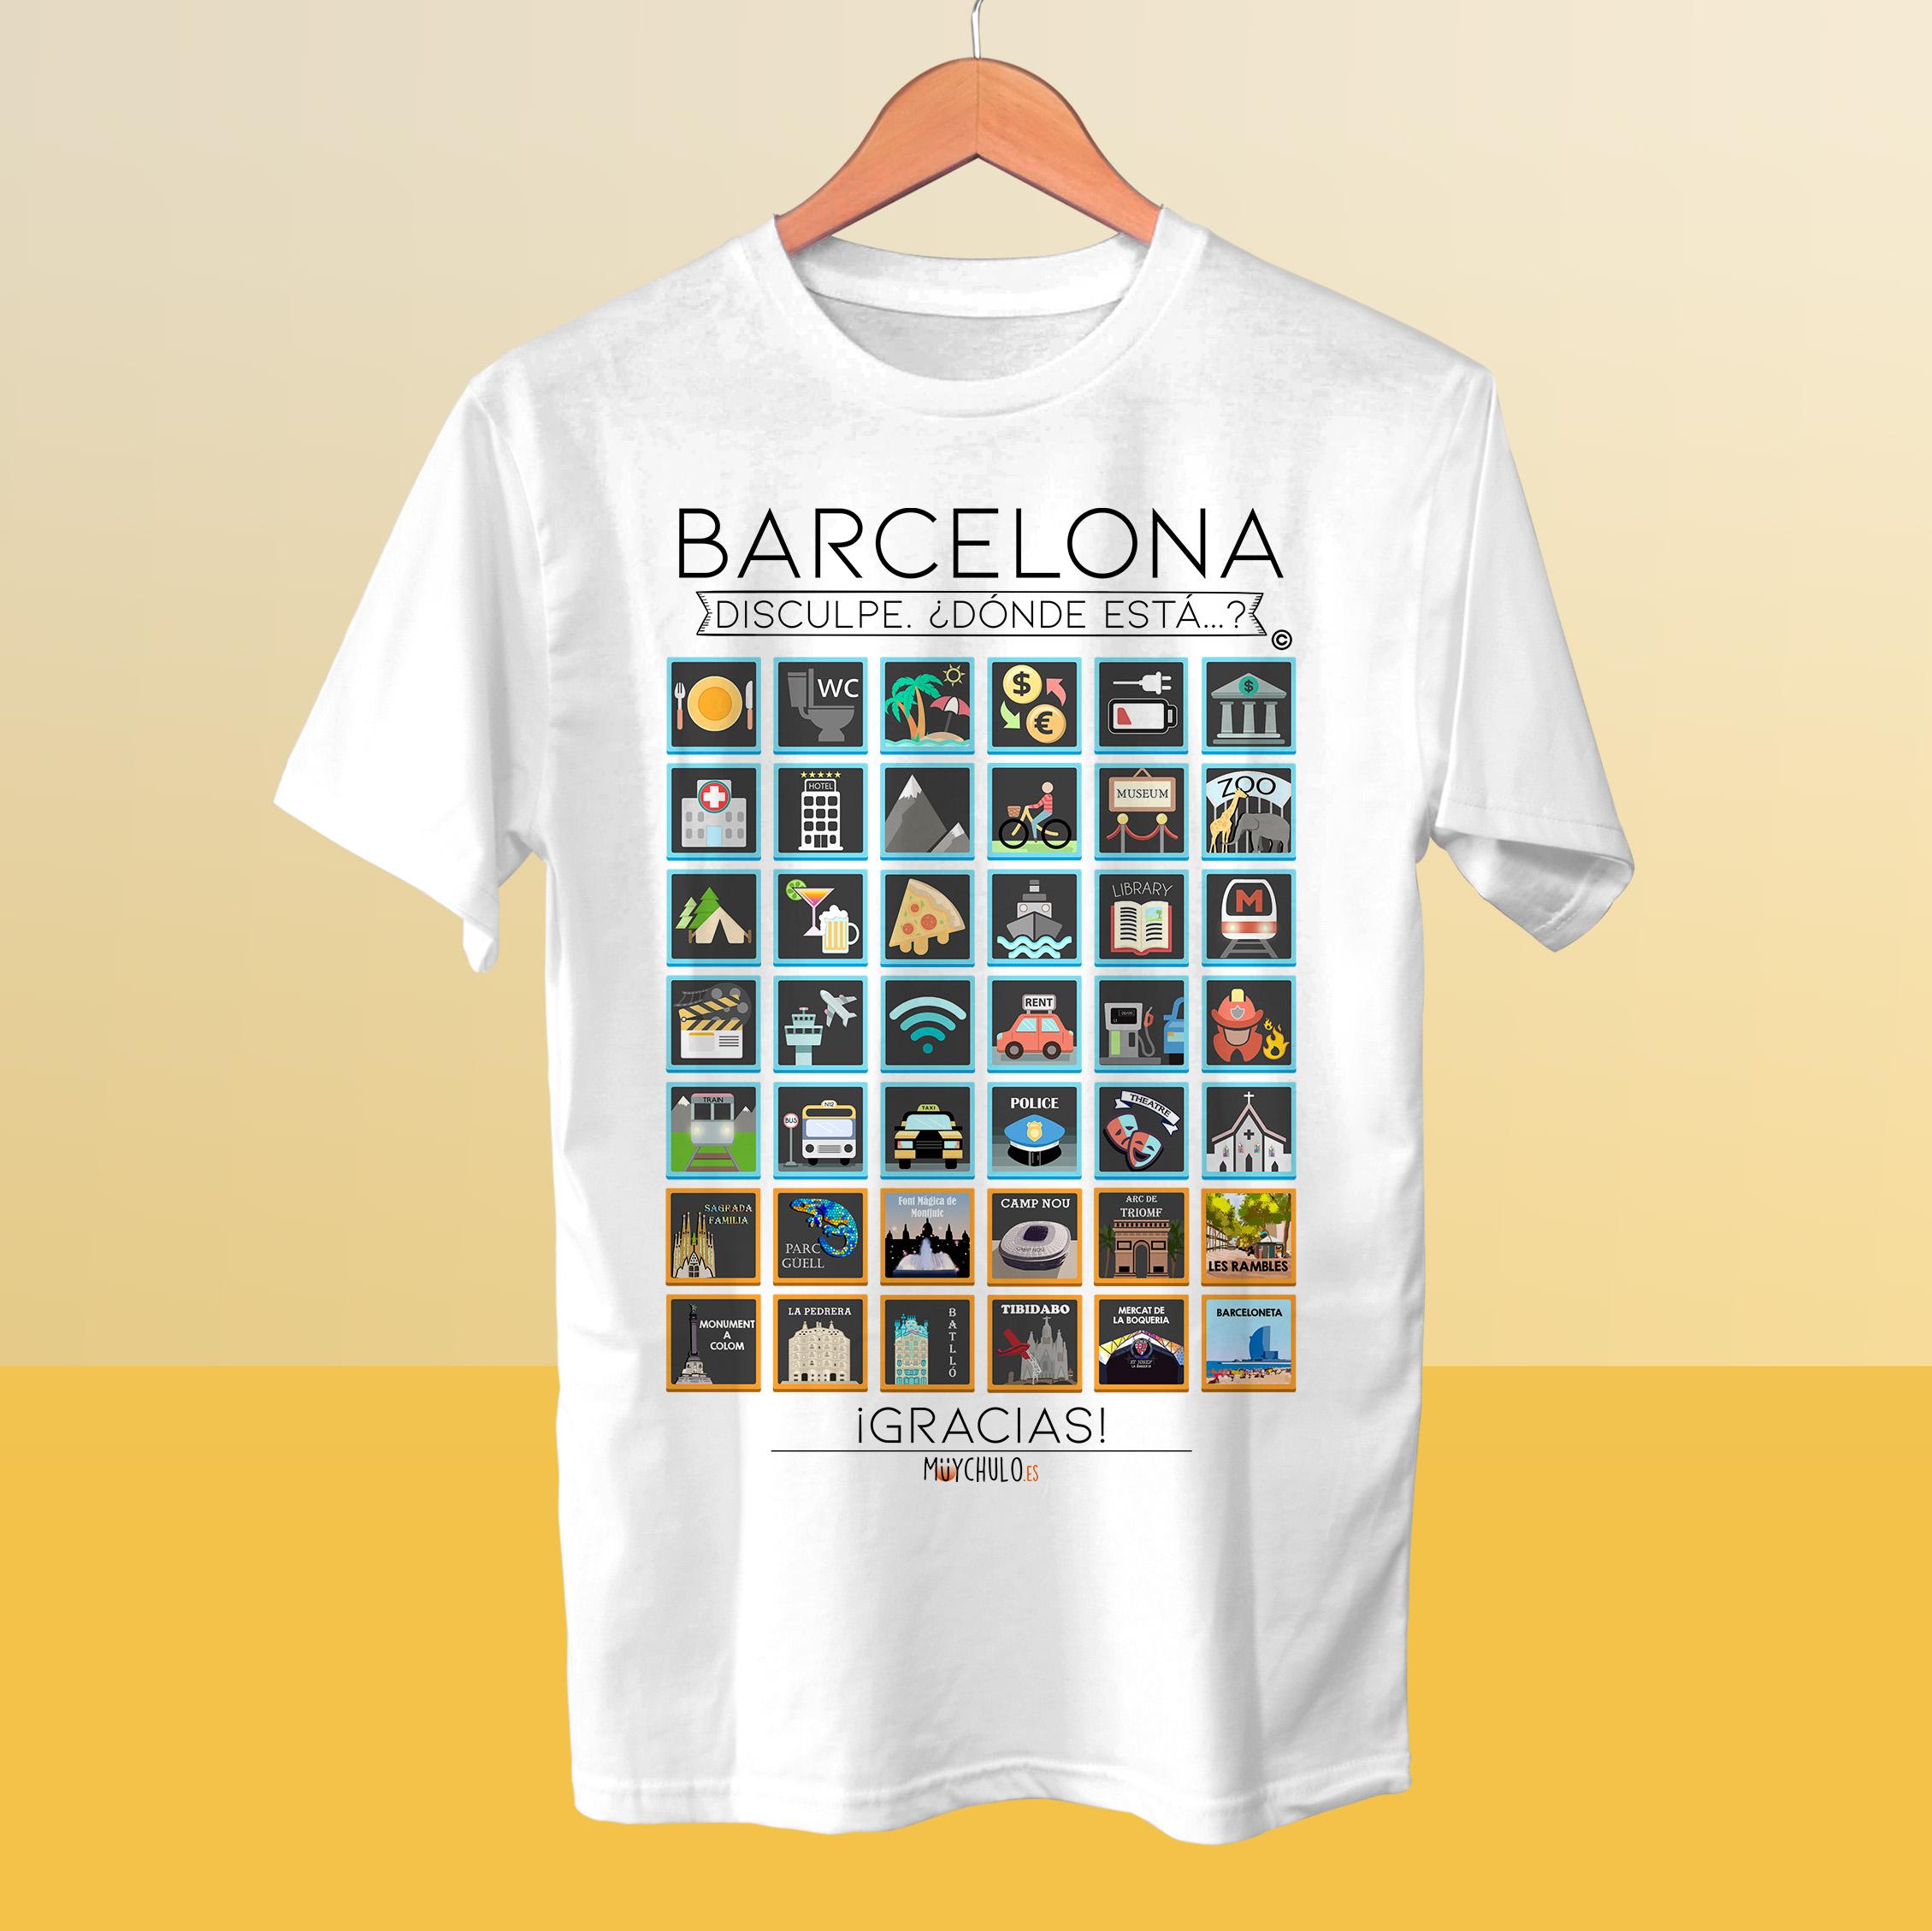 7824612f3 Barcelona Traveller S T Shirt Travellers Viaja Y Disfruta